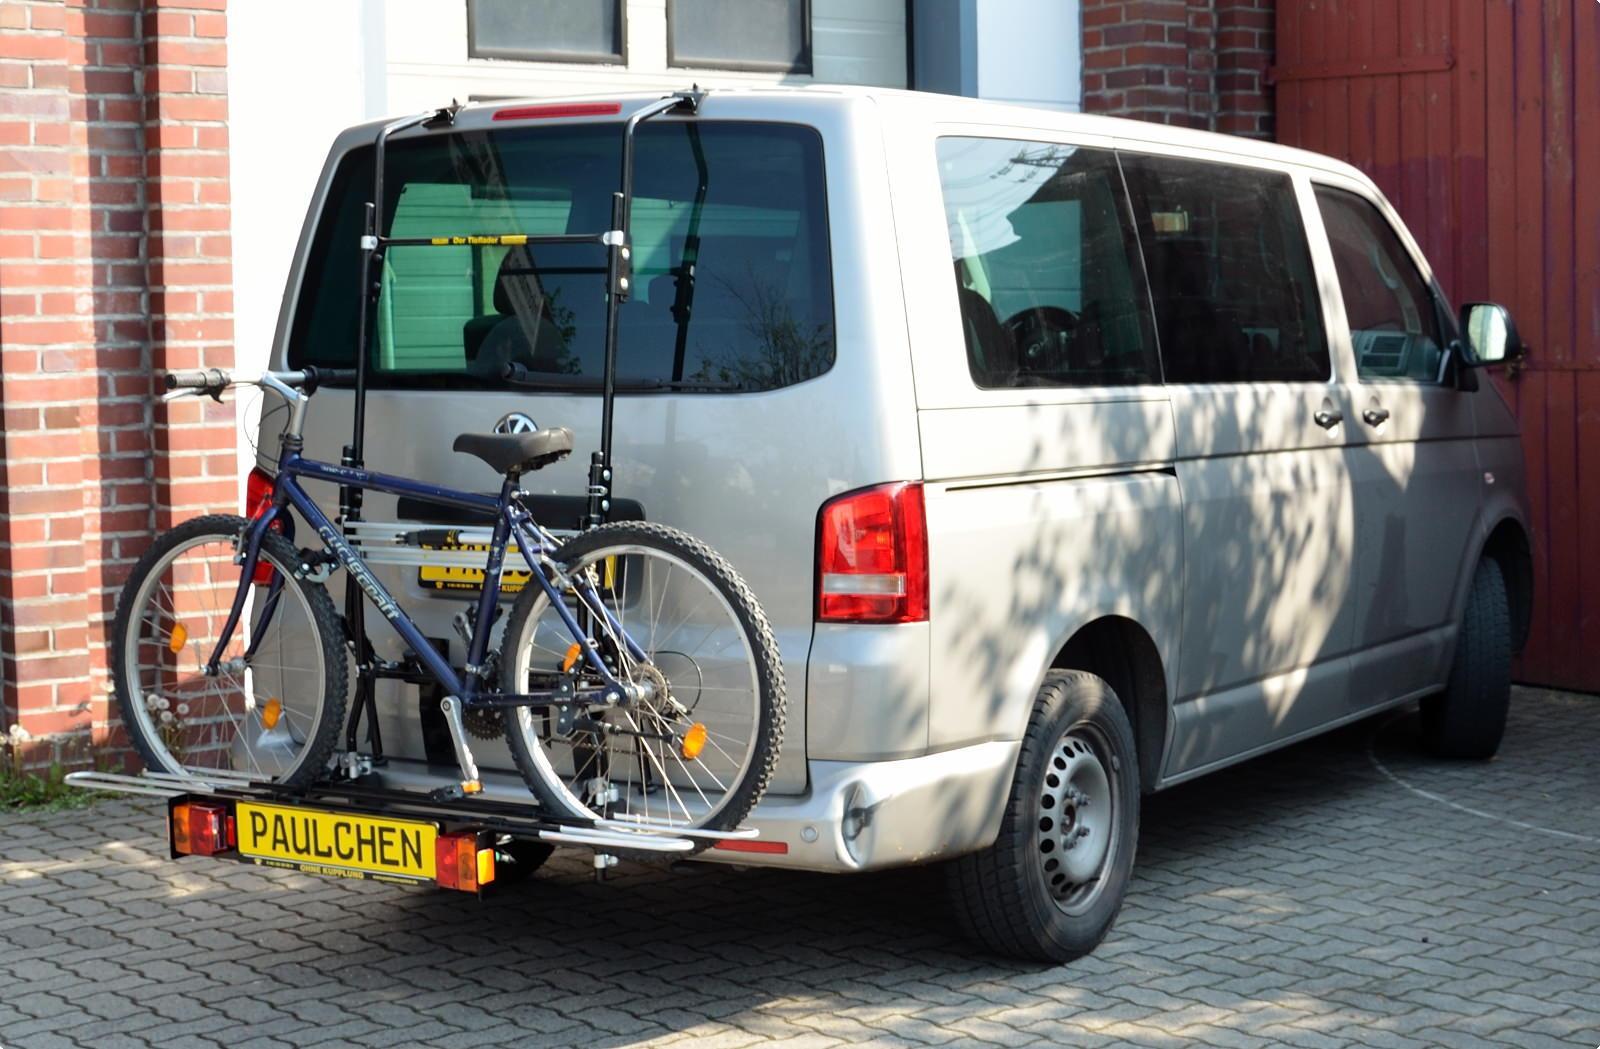 bicycle carrier for vw bus t5 paulchen hecktr ger system. Black Bedroom Furniture Sets. Home Design Ideas